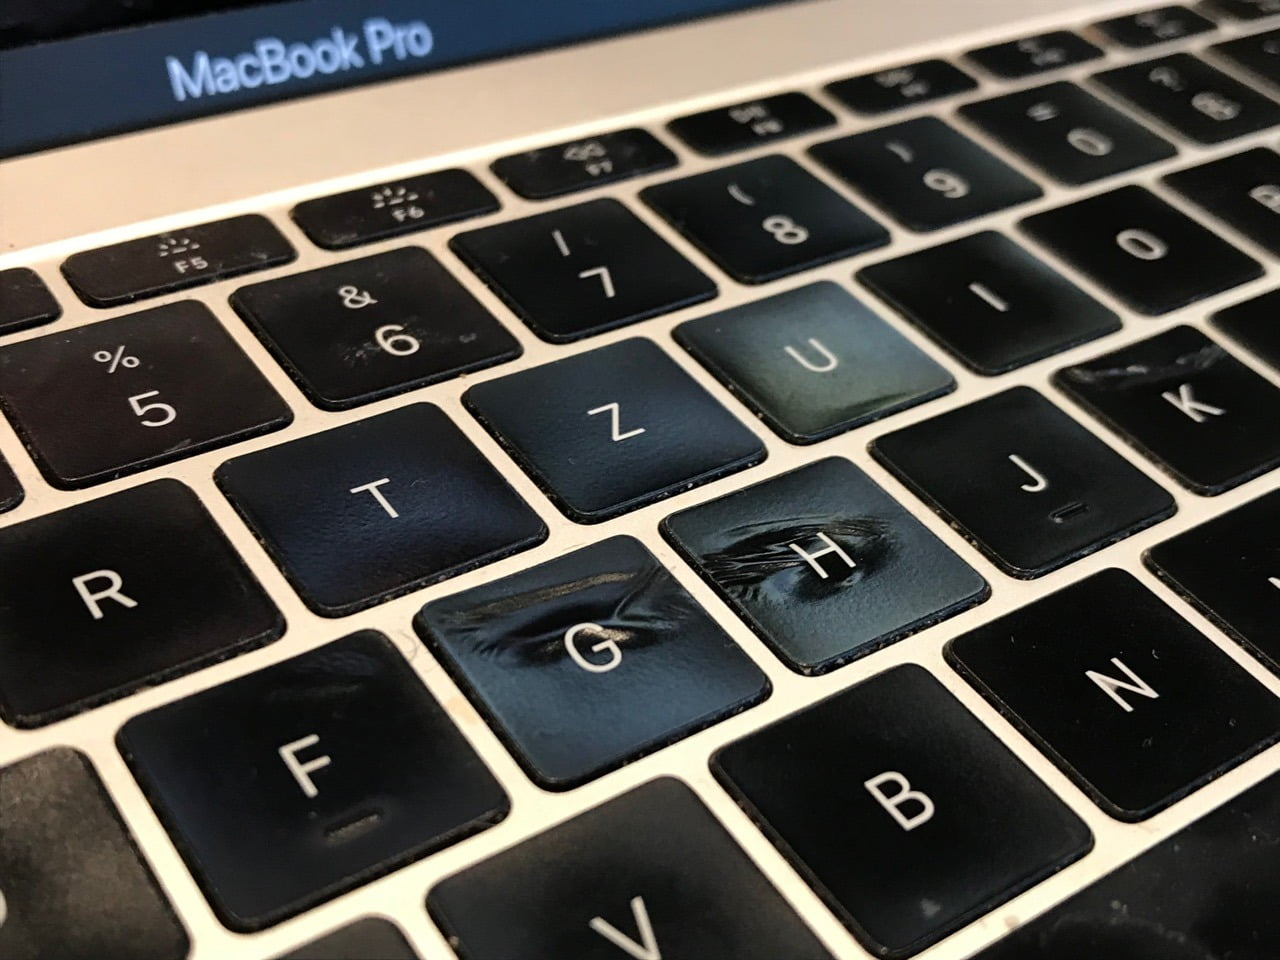 geschmolzene macbook pro tasten